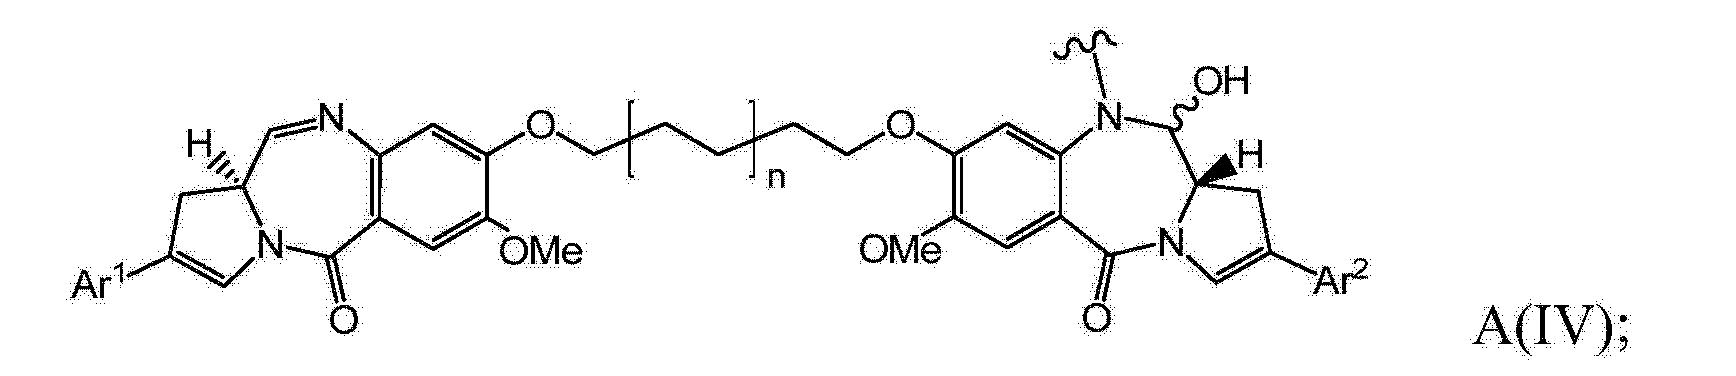 Figure CN104411721AD00732